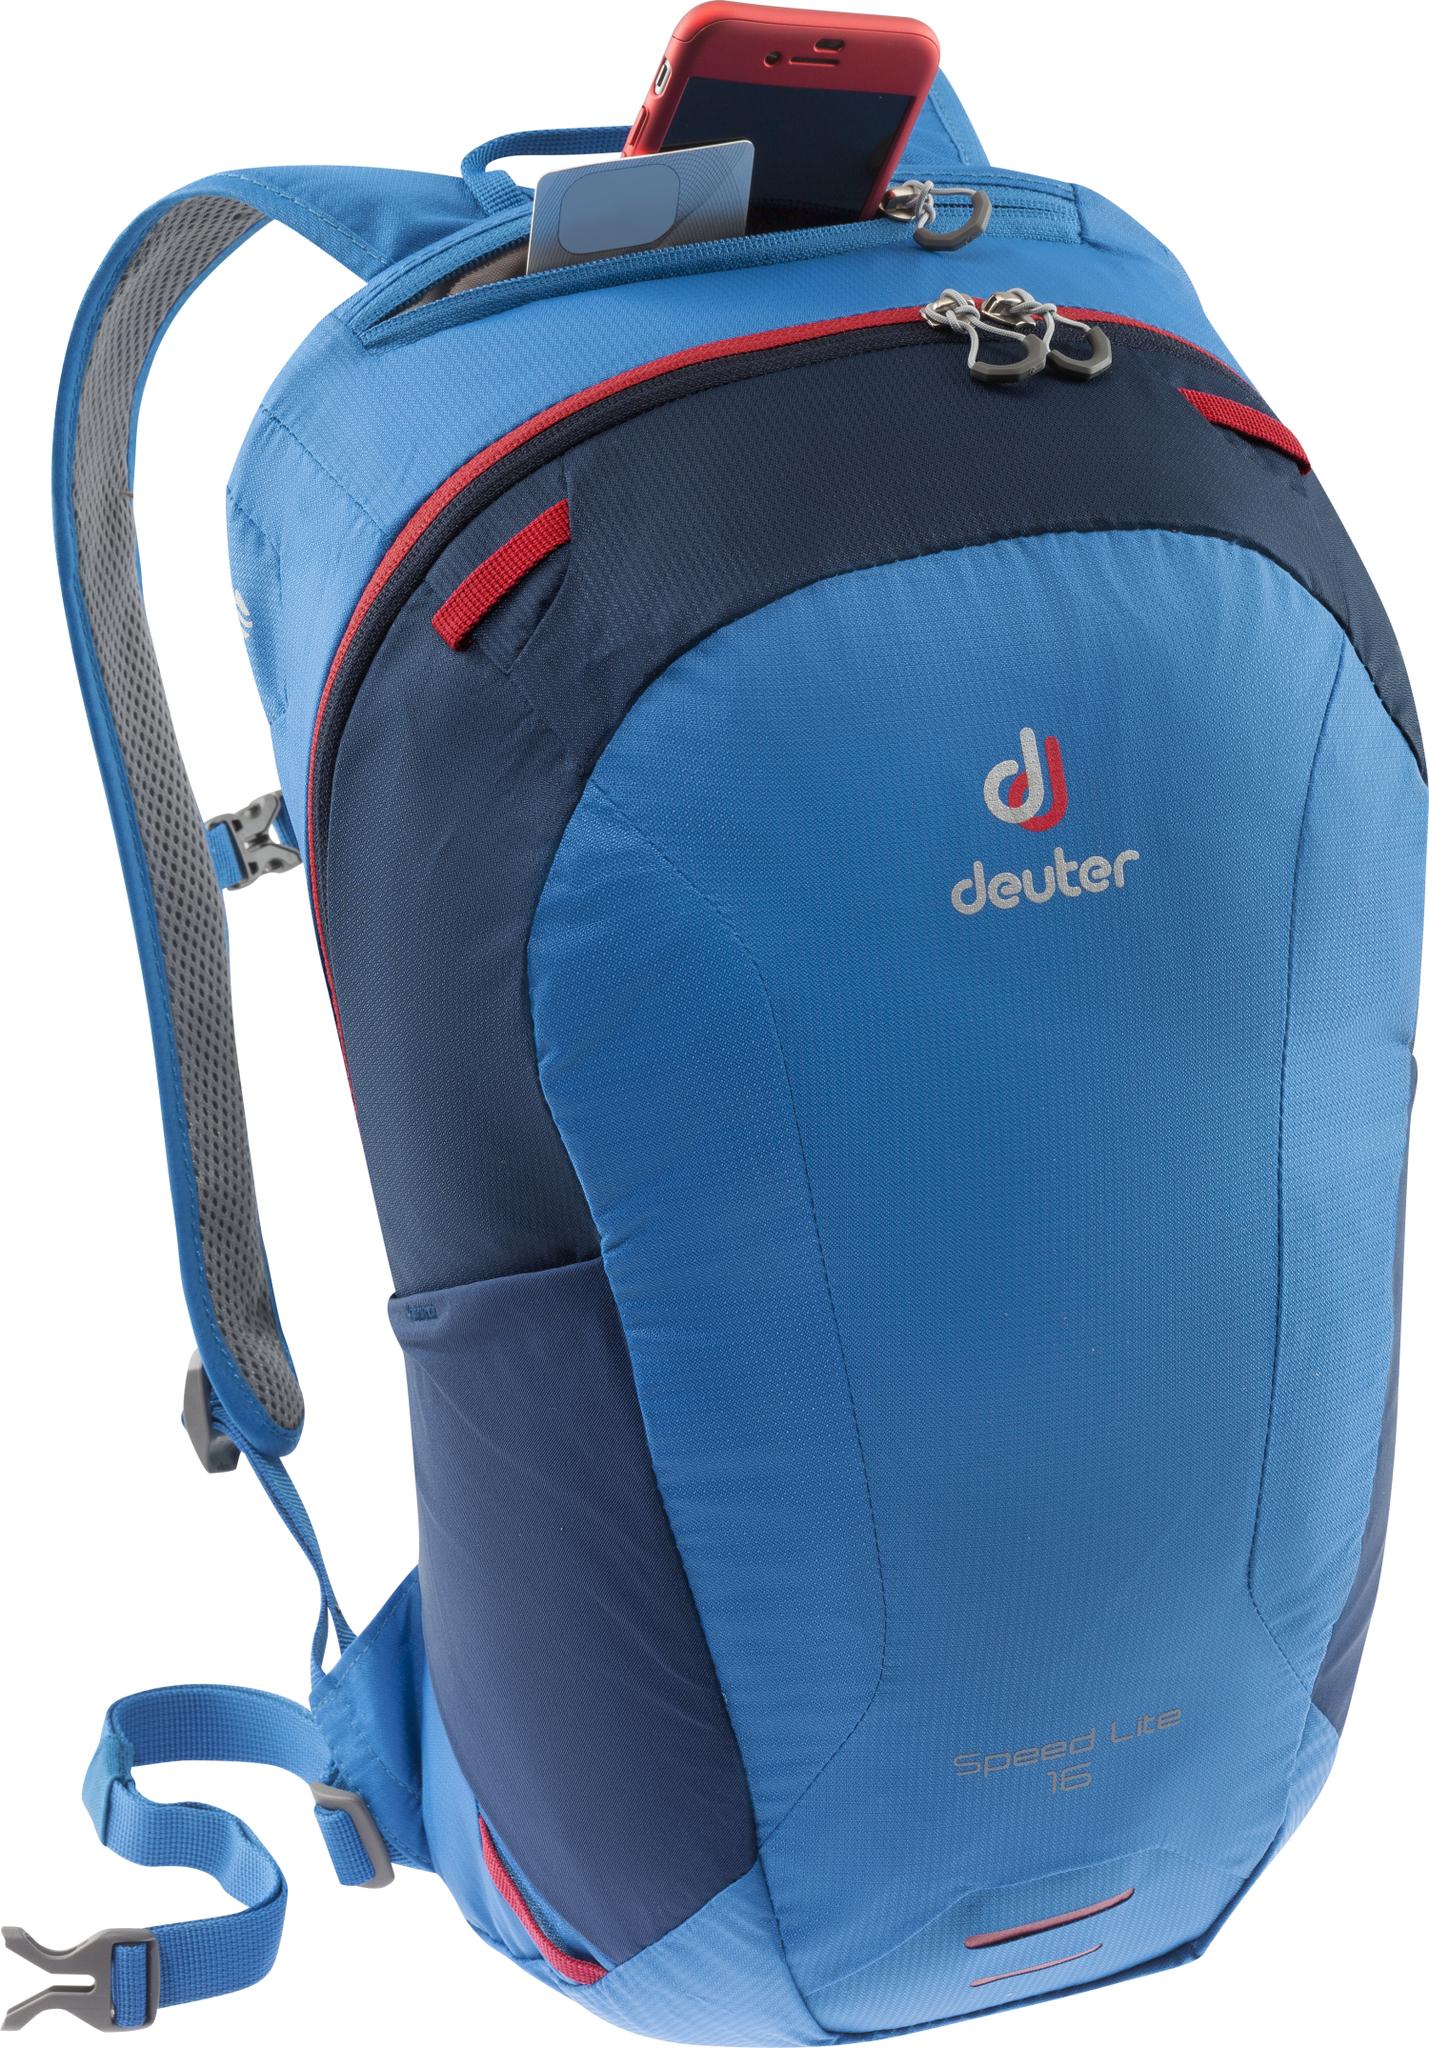 Туристические рюкзаки легкие Рюкзак с поясом Deuter Speed Lite 16 (2020) 3410119-3100-SpeedLite16-d3.jpg